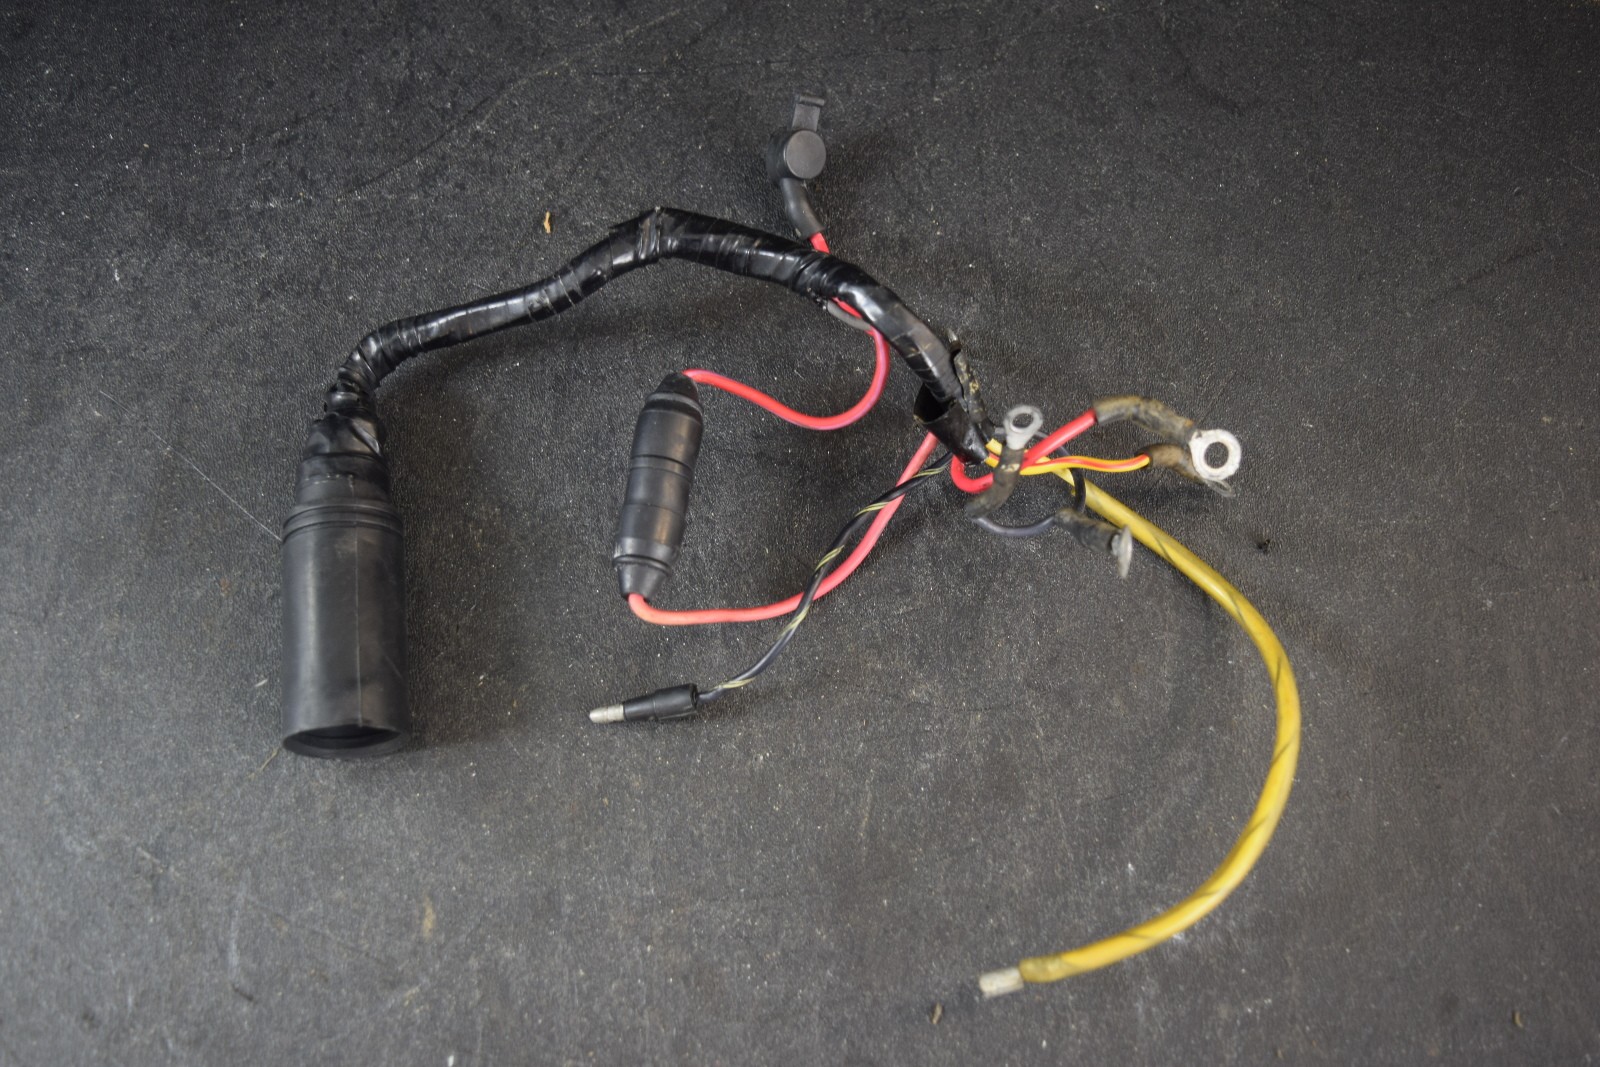 1980 04 mercury wiring harness 92436a5 92436a3 15 18 20 25 Mercury Outboard Tach Wiring Diagram 30 HP Mercury Outboard Wiring Diagram